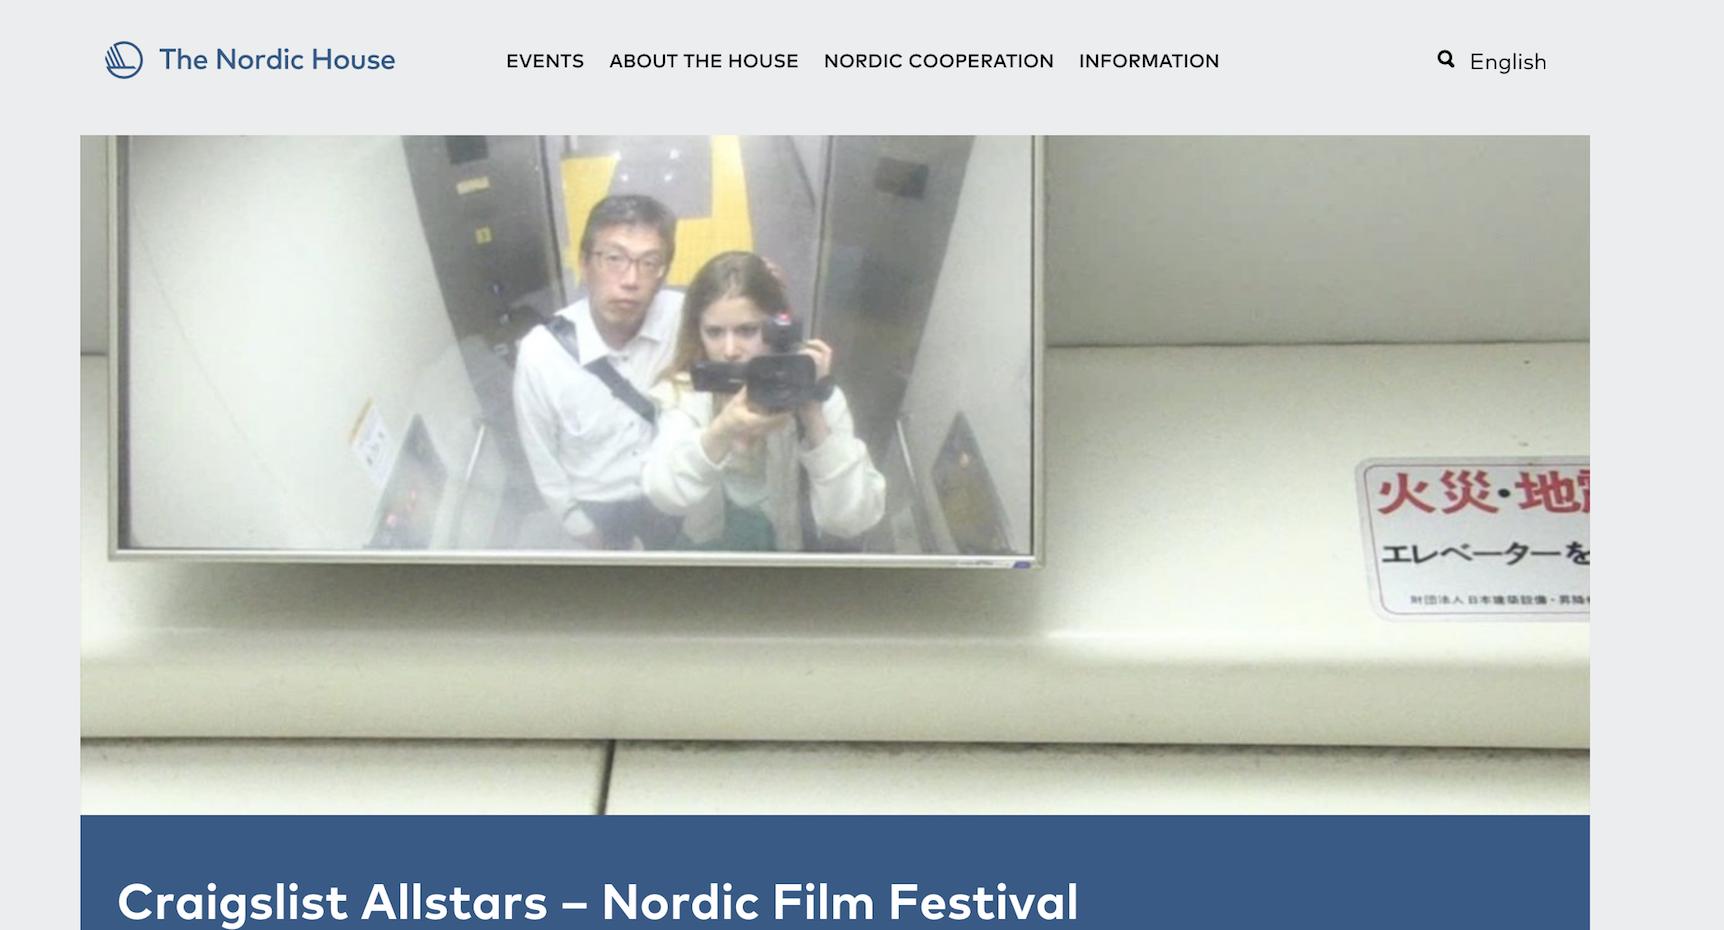 Reykjavik! Craigslist Allstars plays 26.2 at the Nordic Film Festival. 9pm @ Norræna húsið